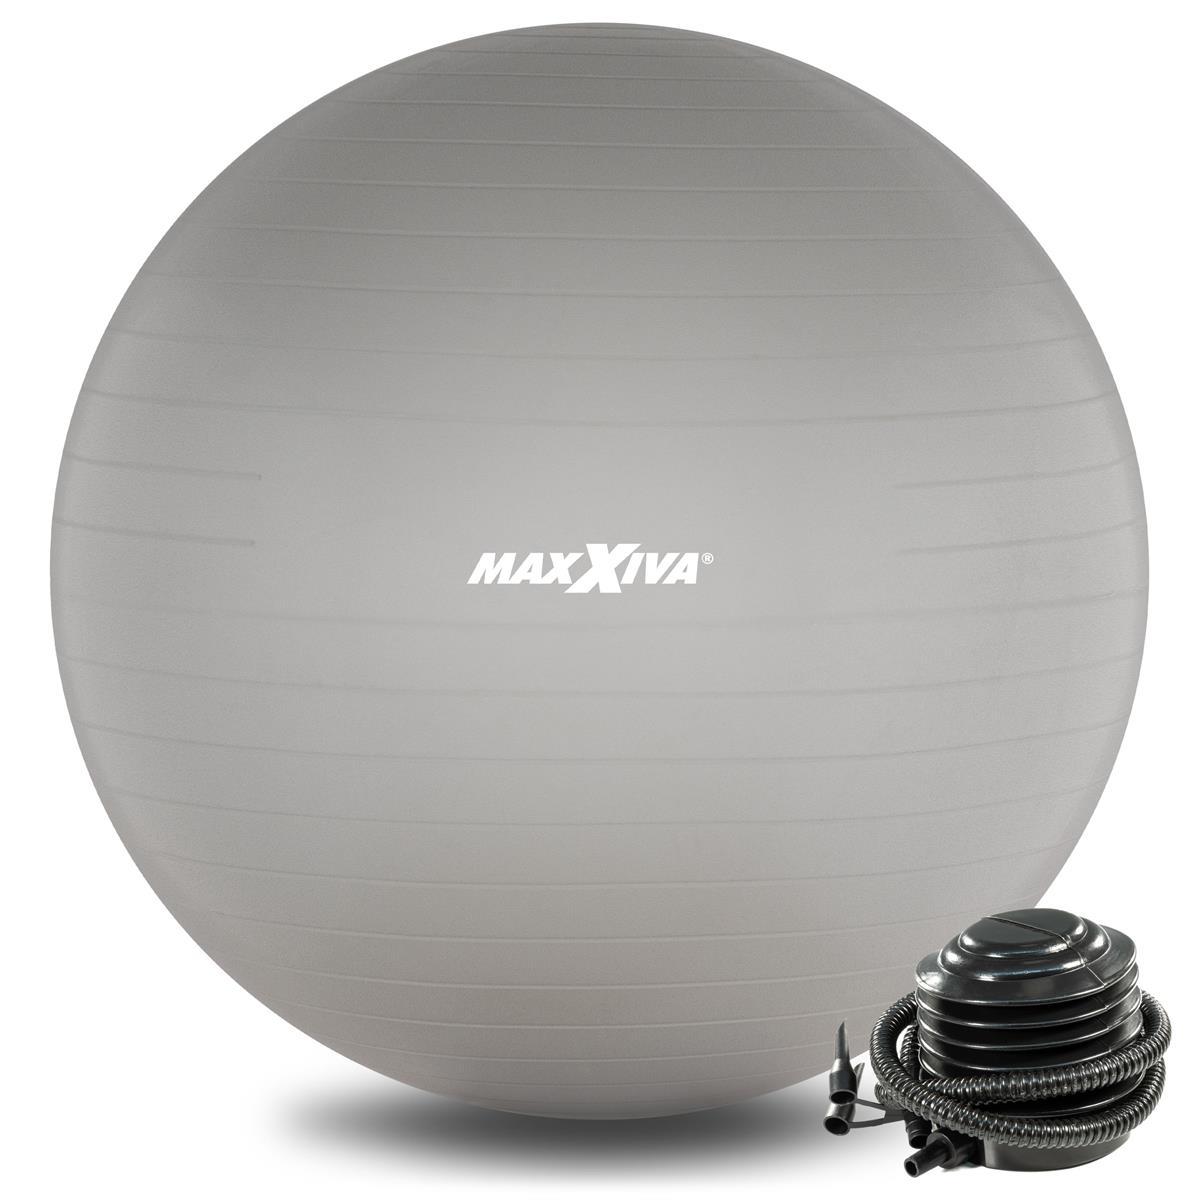 MAXXIVA Gymnastikball Ø 85 cm Silber mit Pumpe Sitzball Fitness Yoga Pilates